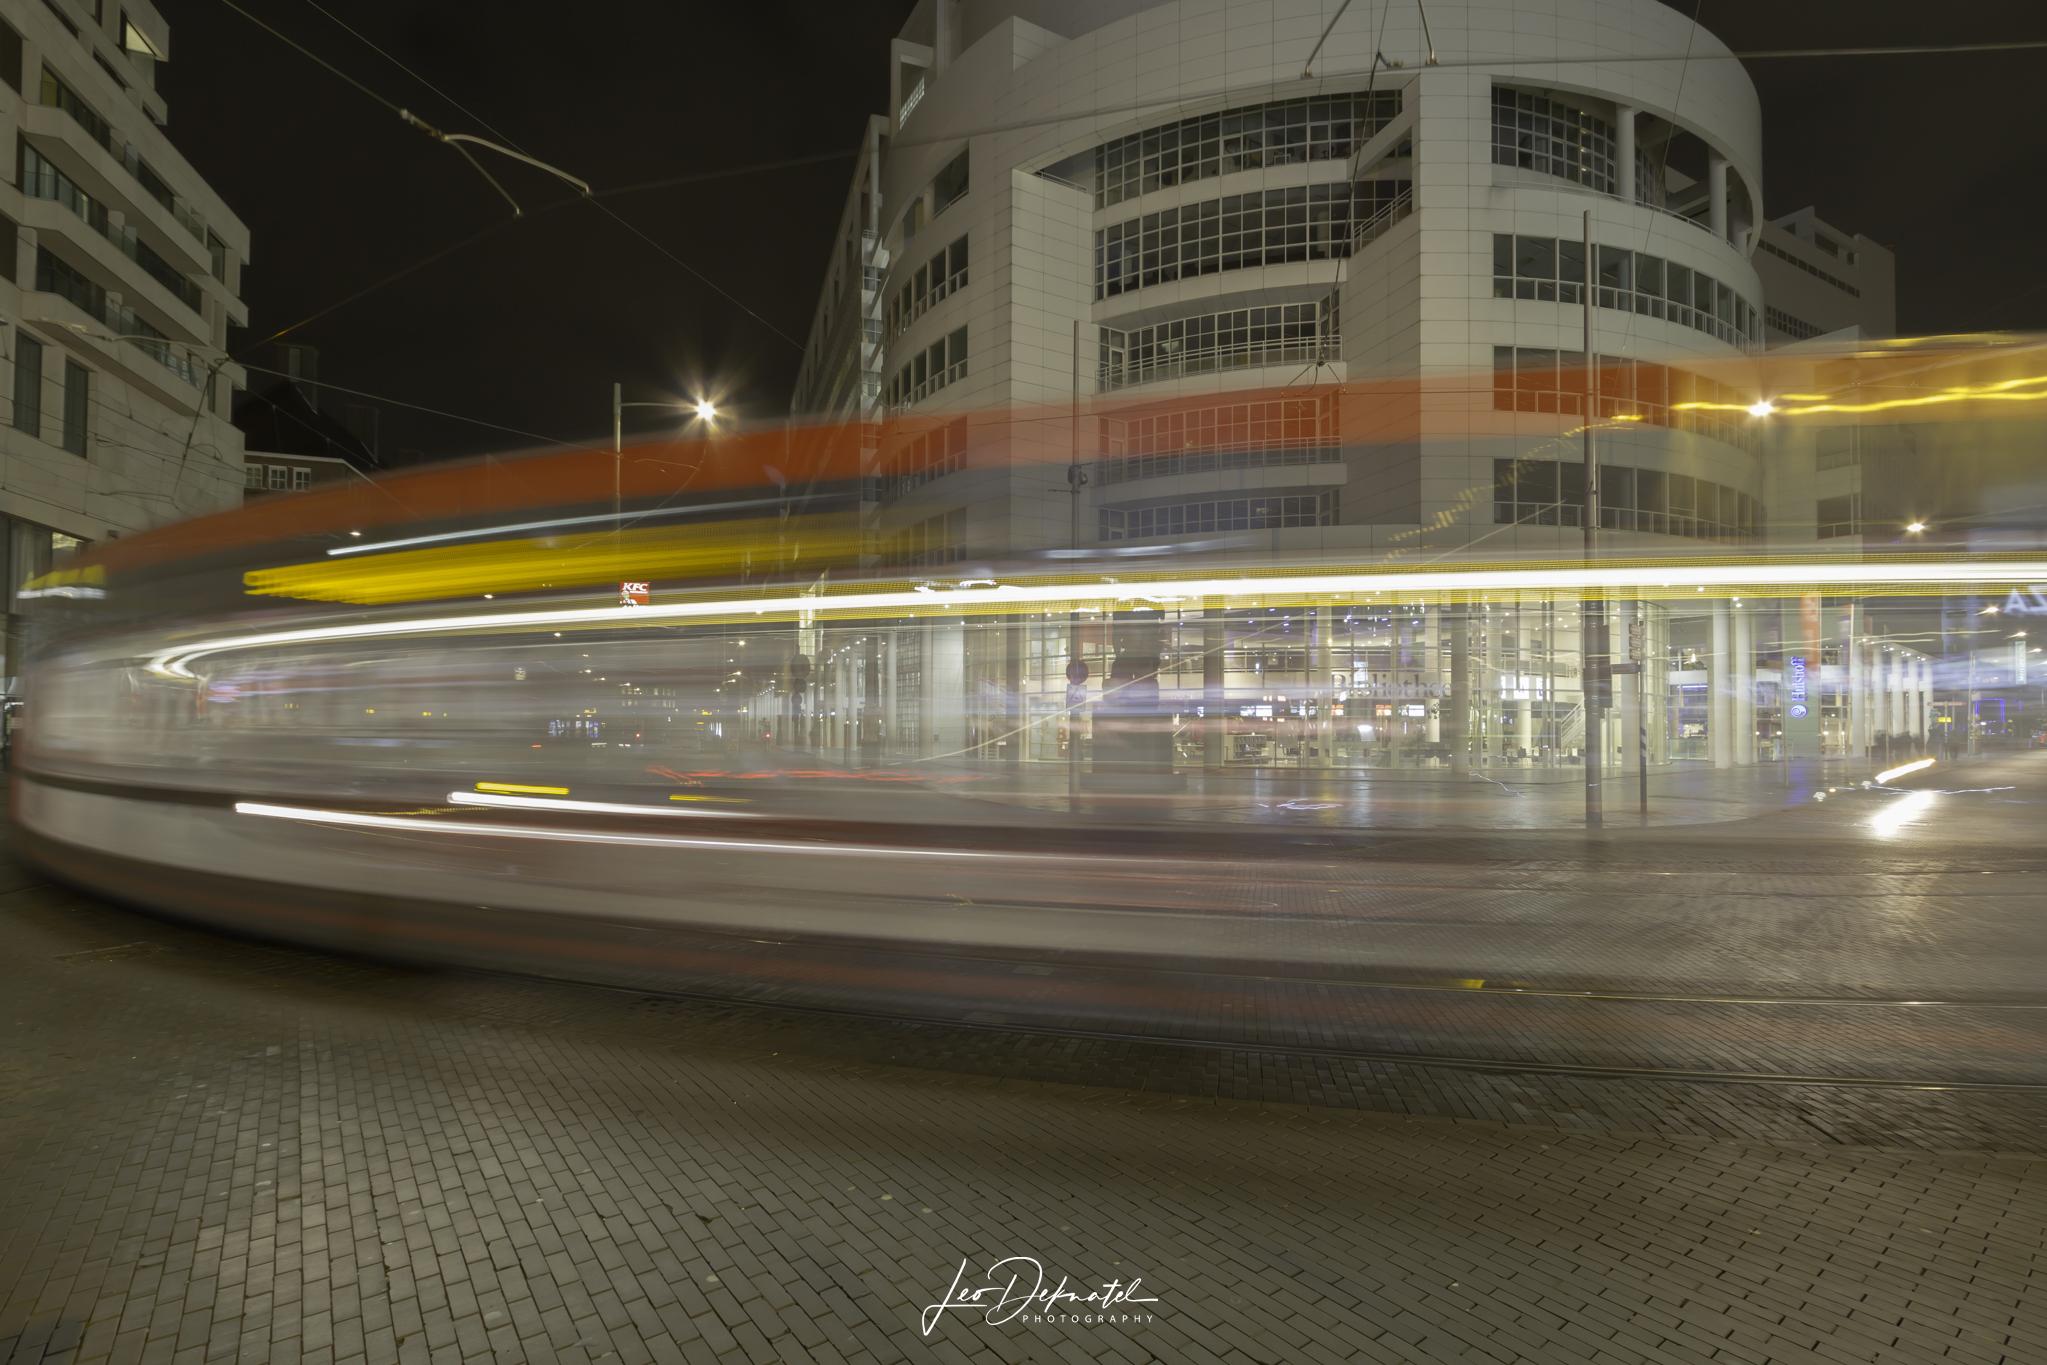 Spui Den Haag, Best off 2018, Avond- nachtfotografie, lange sluitertijden